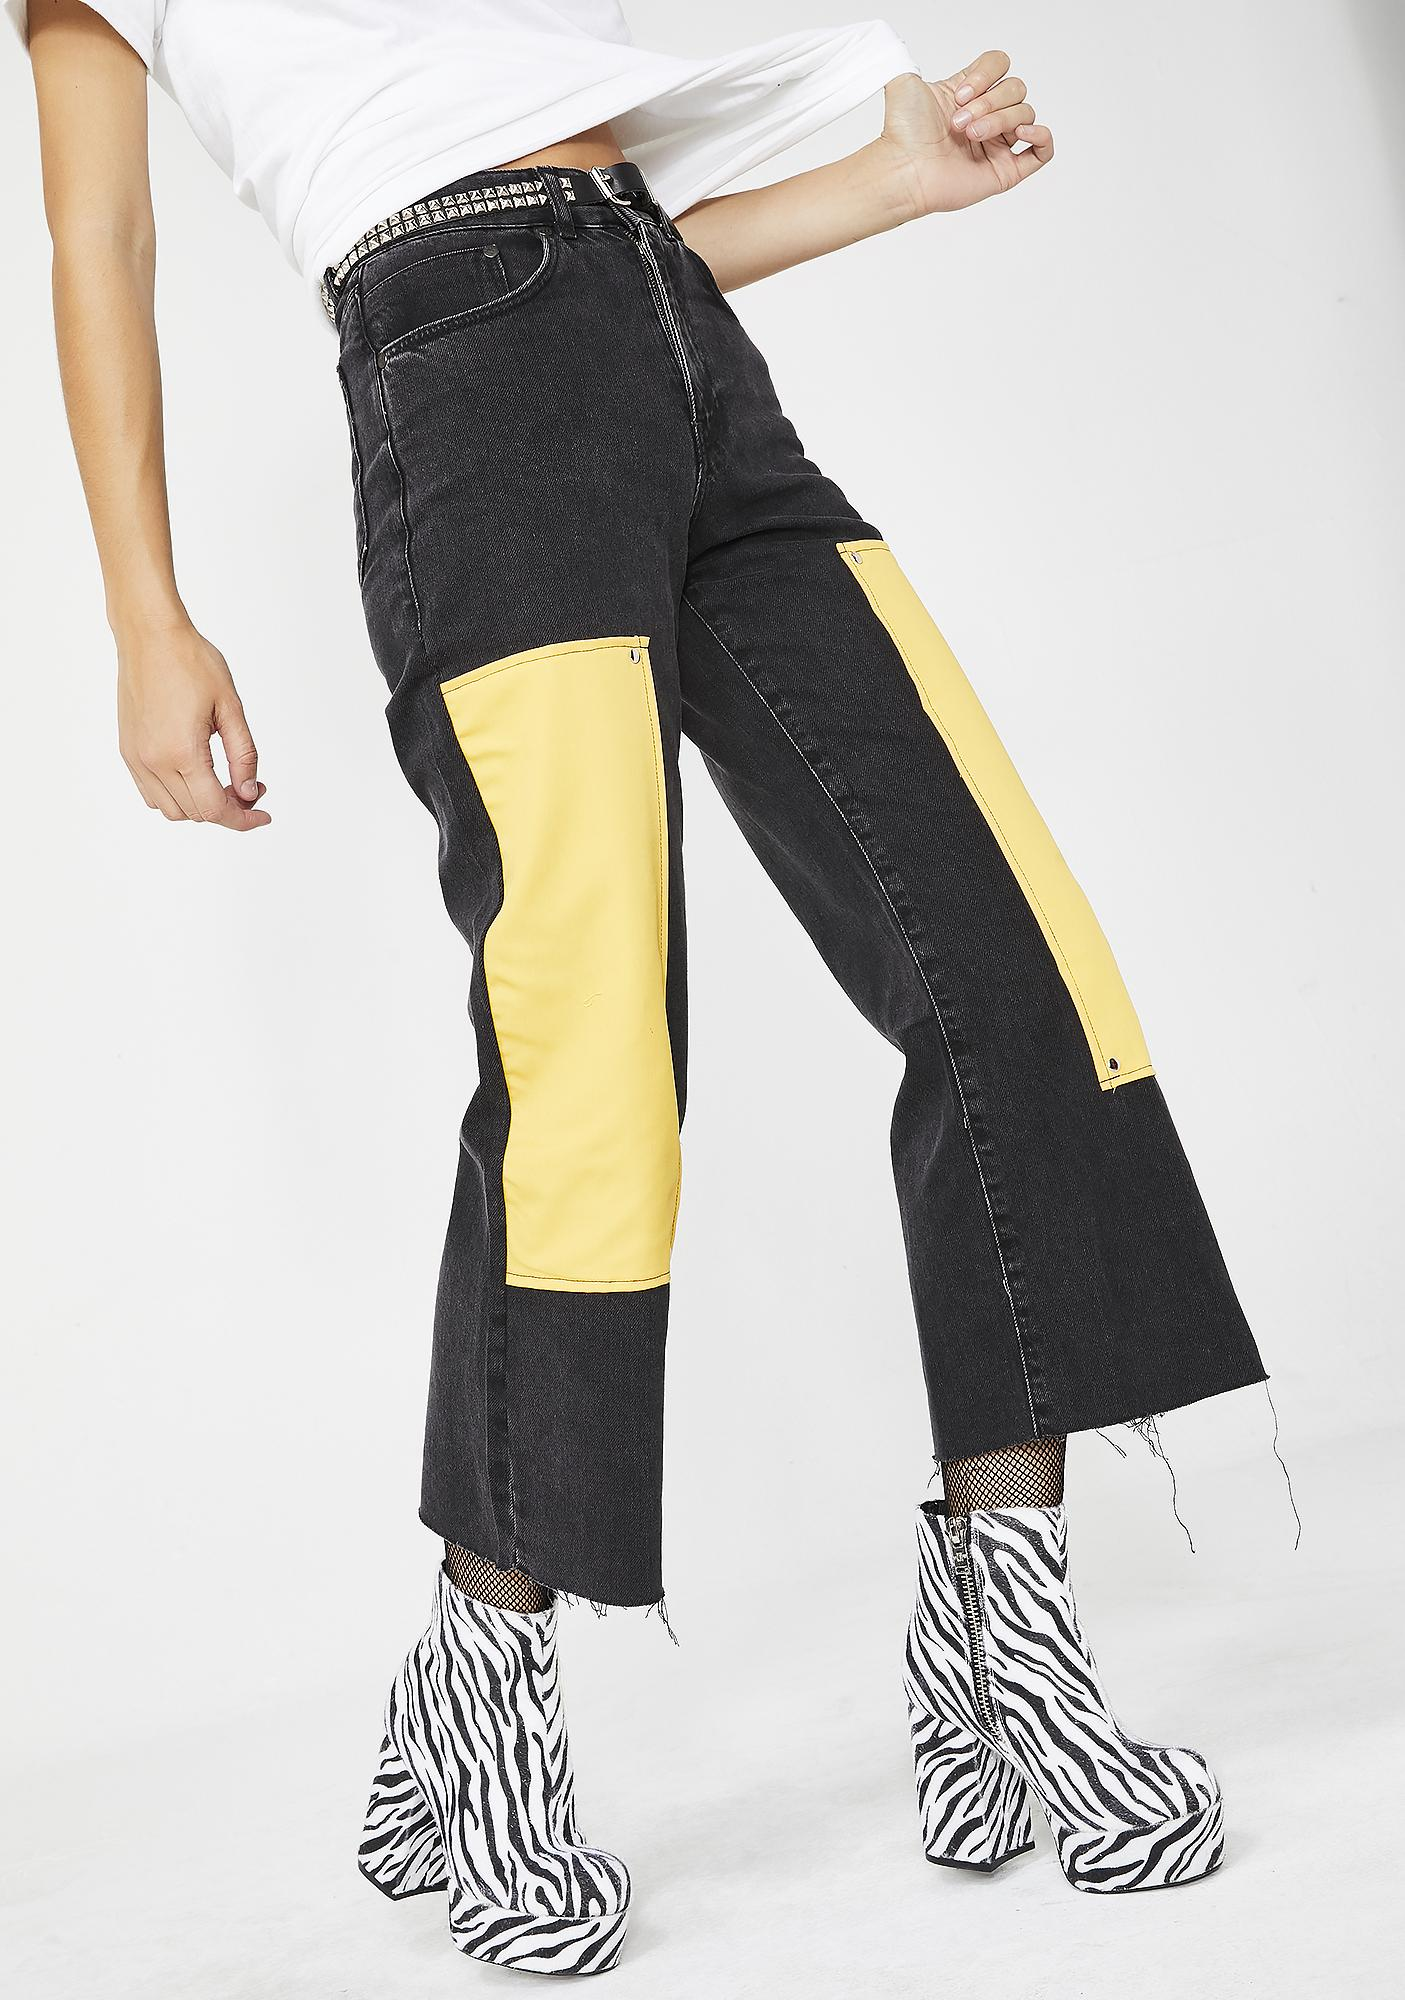 The Ragged Priest Scrap Jeans